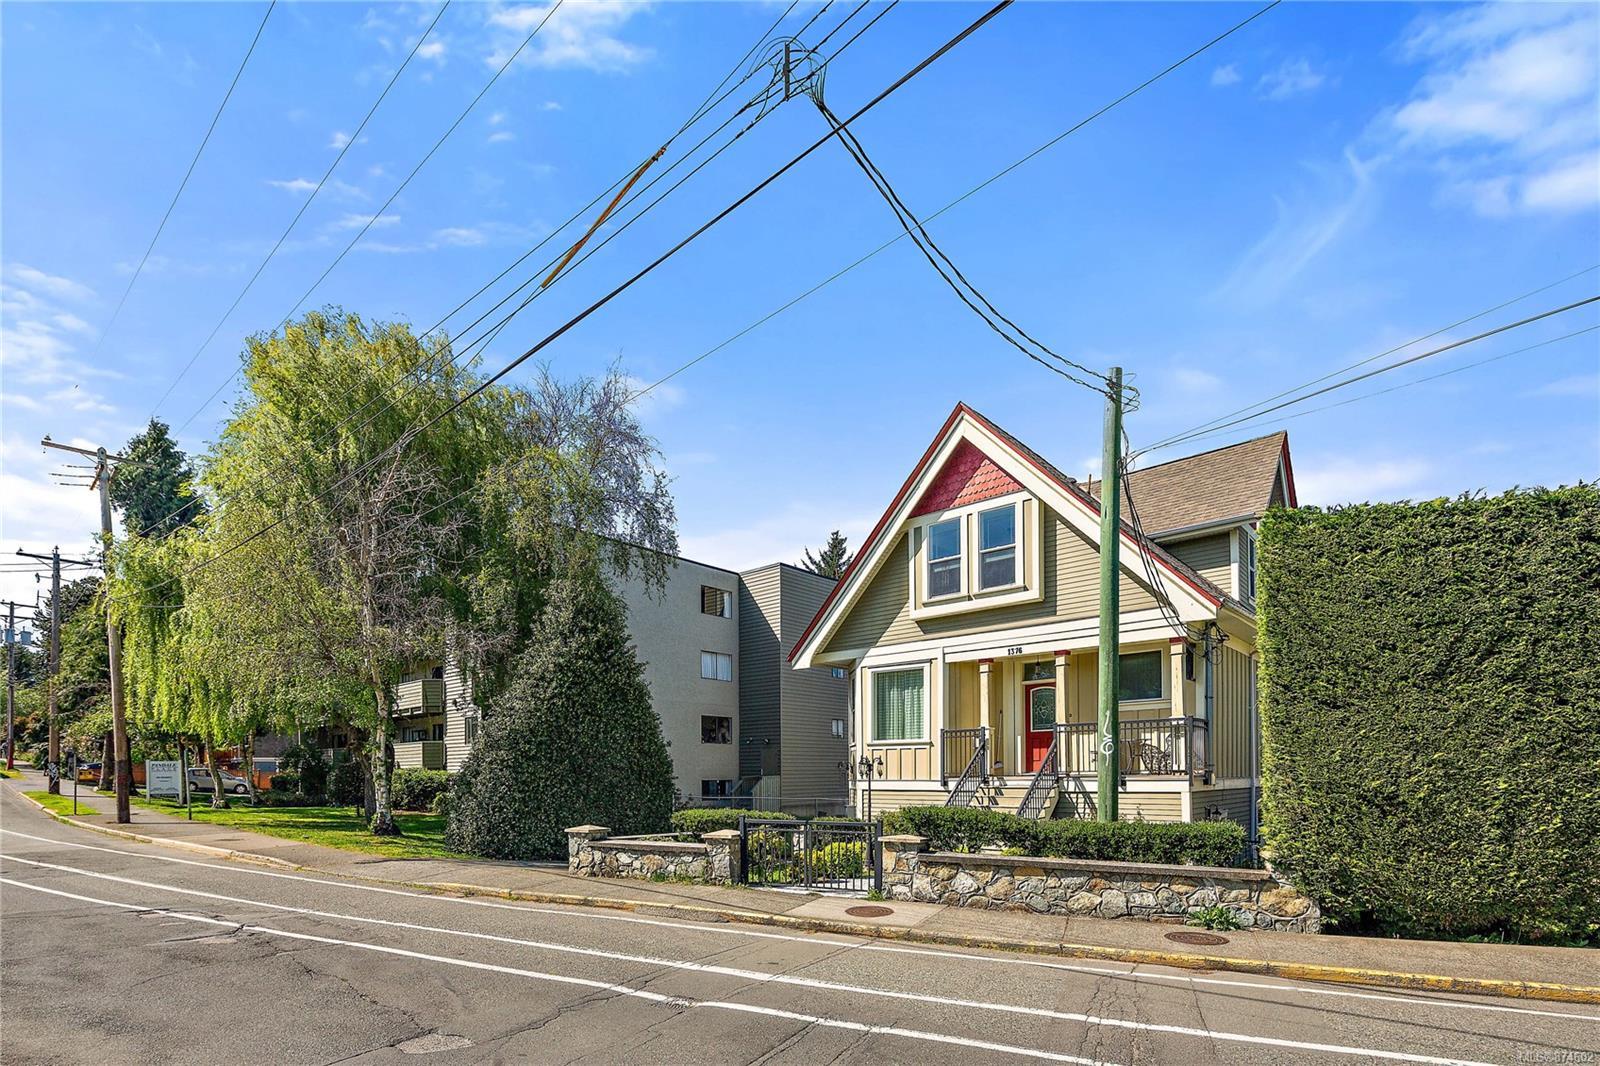 Photo 25 at 1 - 1376 Pandora Avenue, Fernwood, Victoria